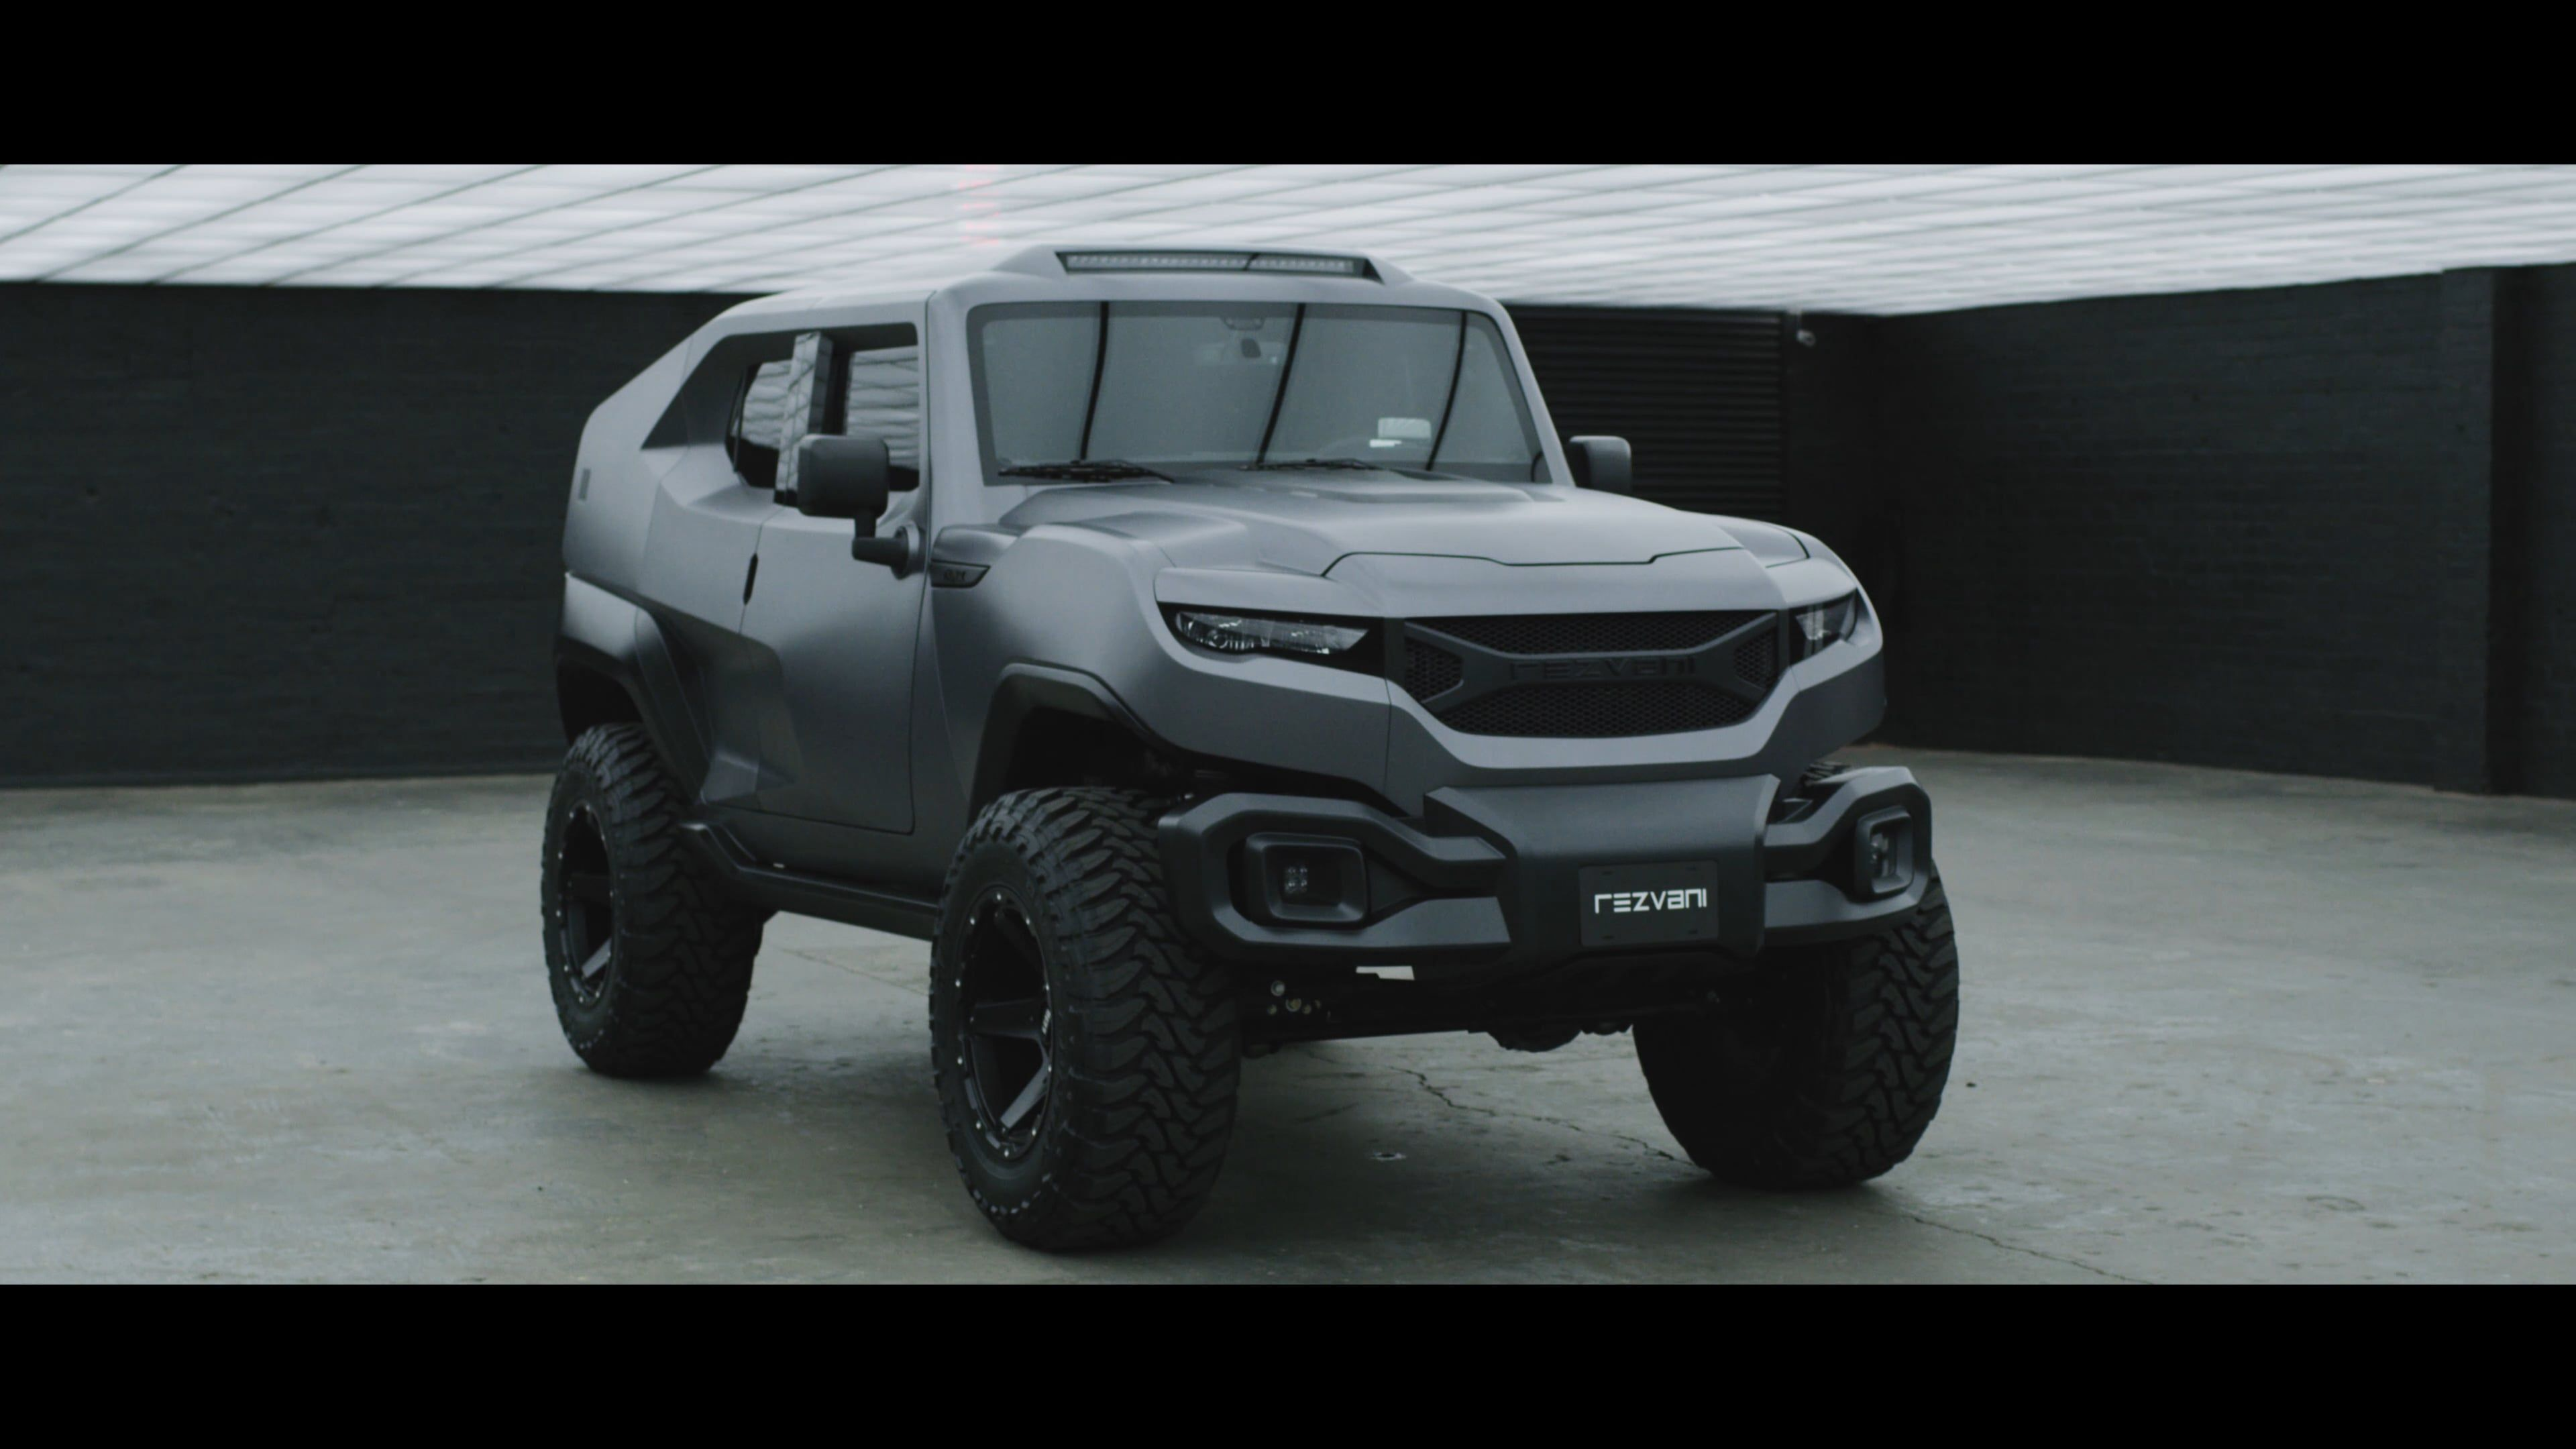 Rezvani Tank Military Inspired Built To Take On Anything Tanks Military Military Inspired Car Videos